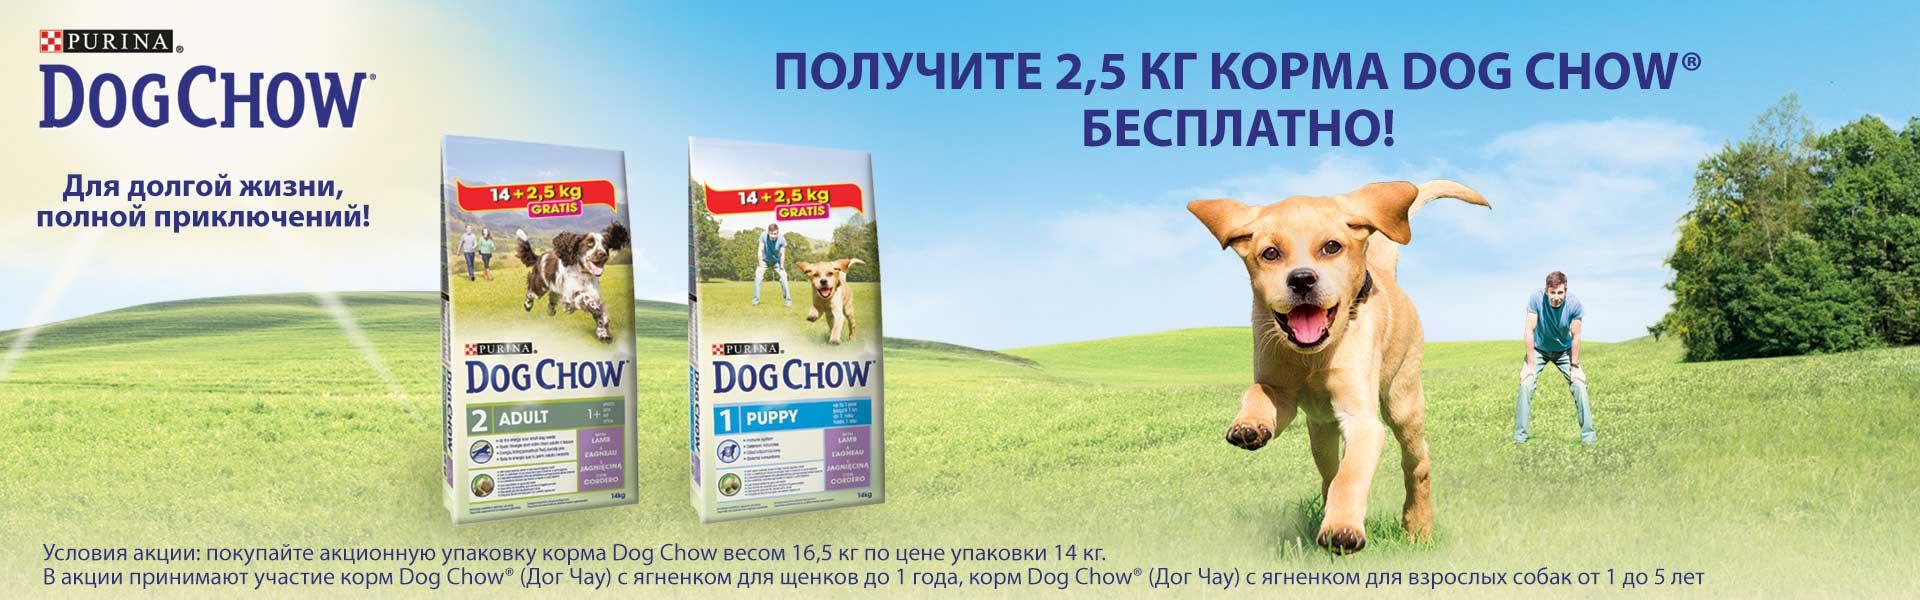 Dog Chow акция